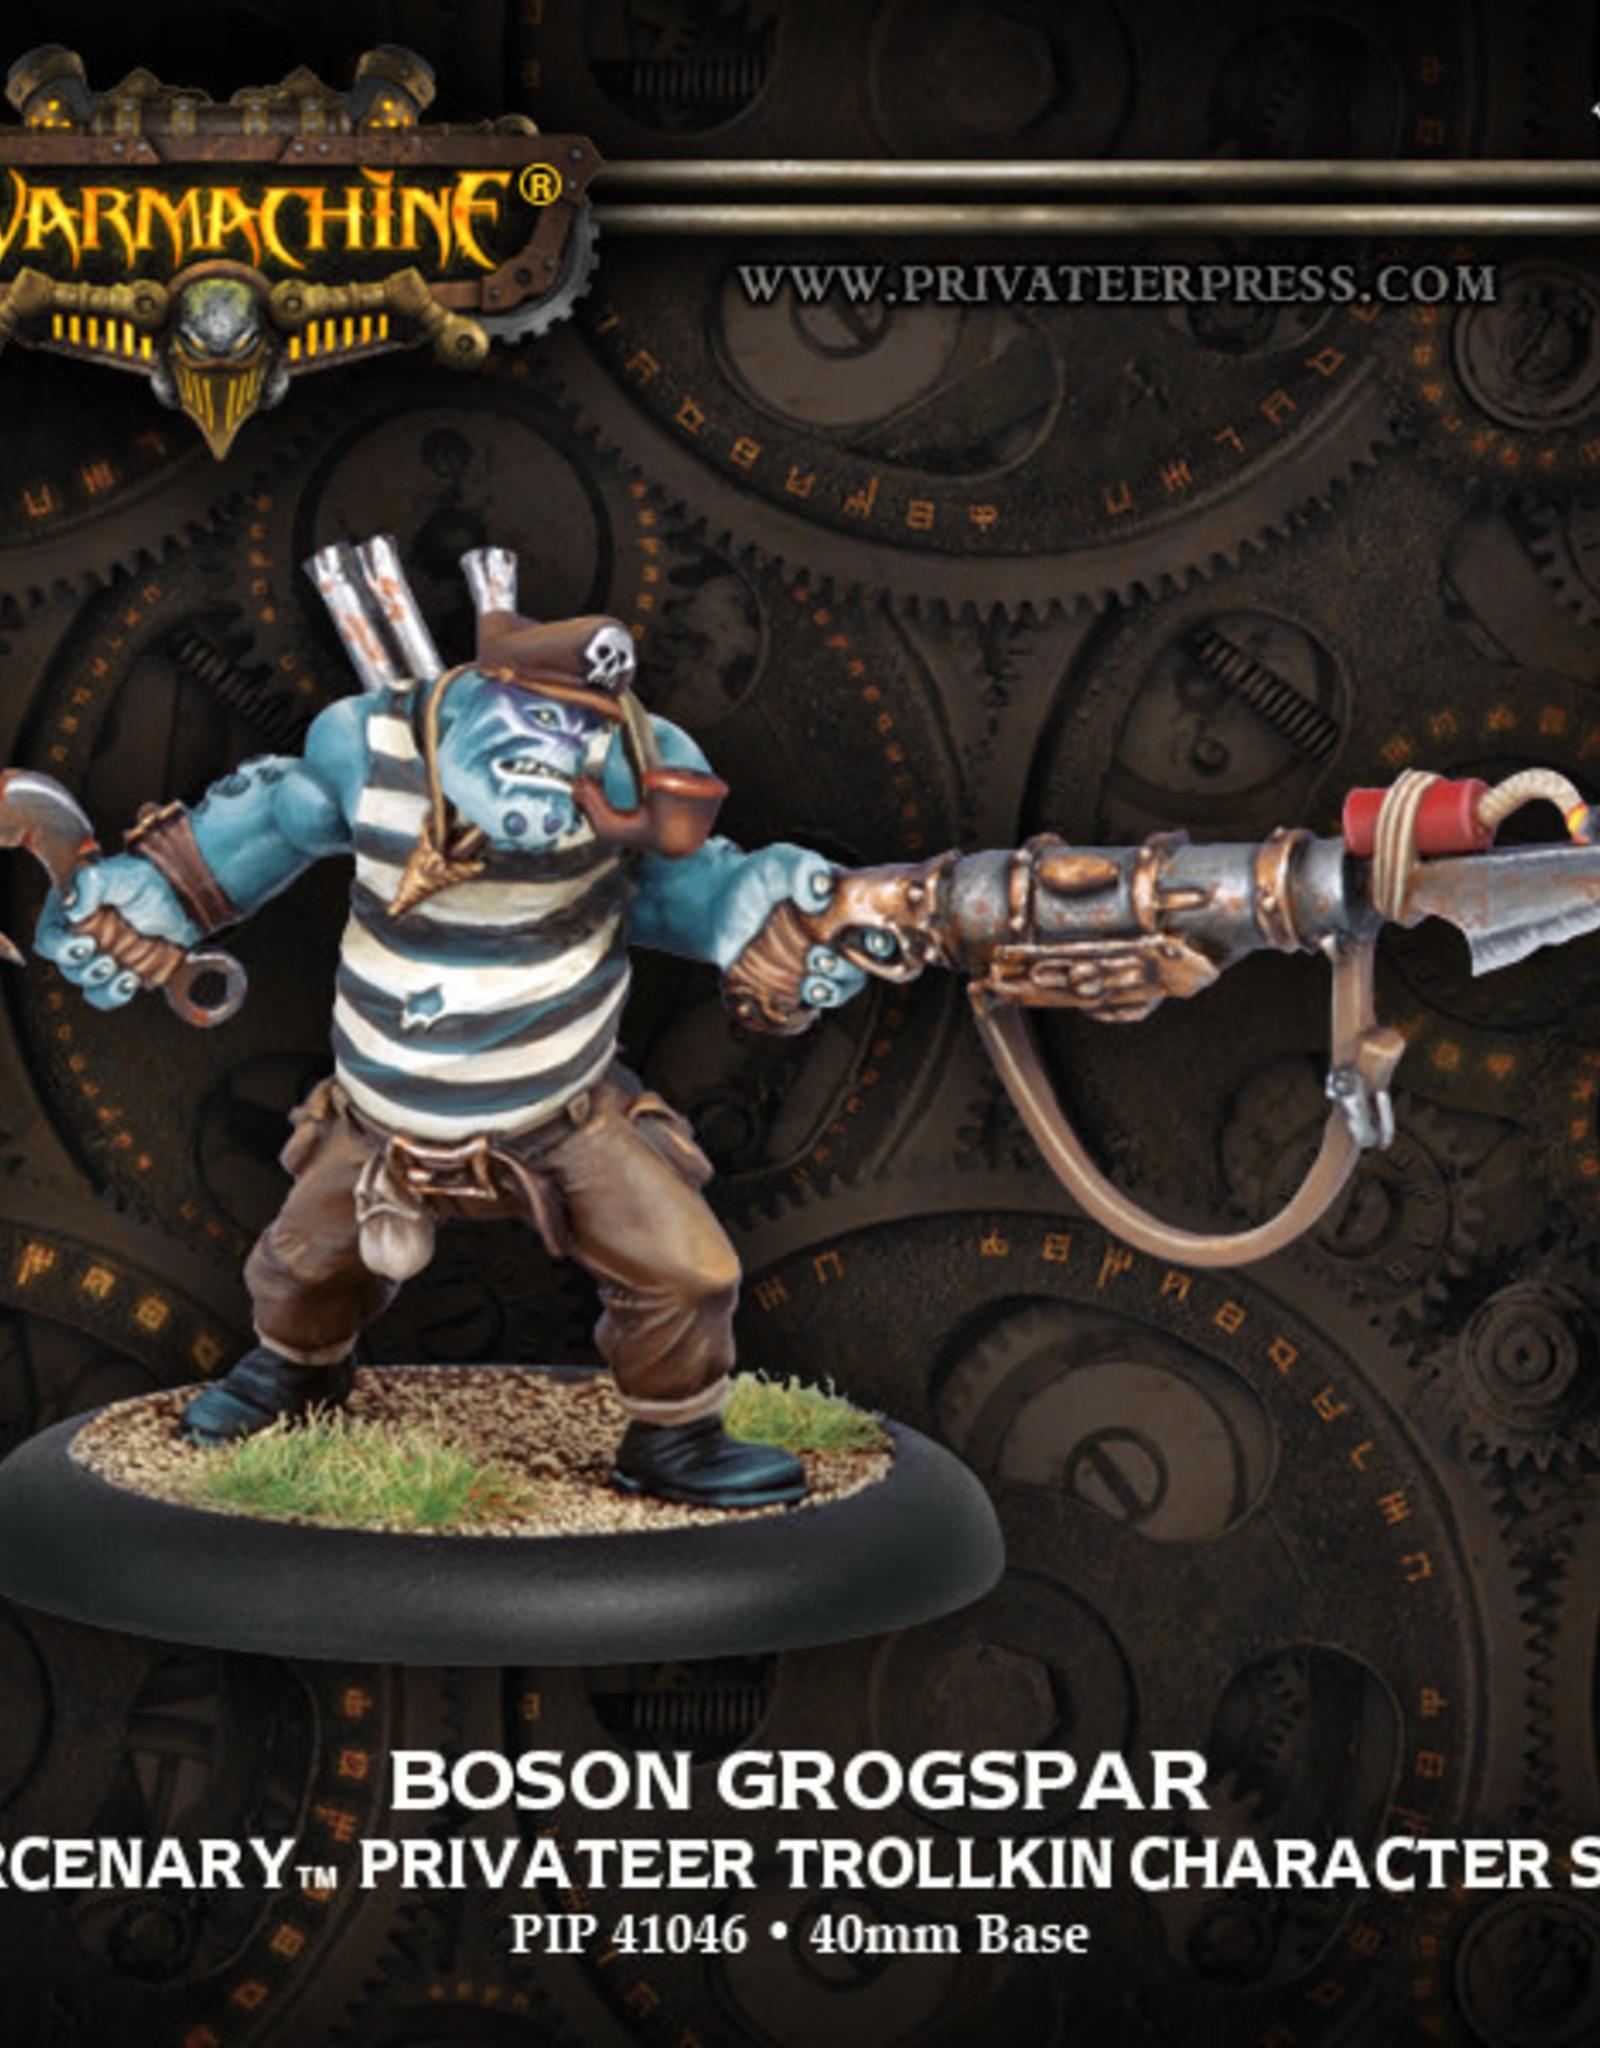 Warmachine Mercenaries - Bosun Grogspar